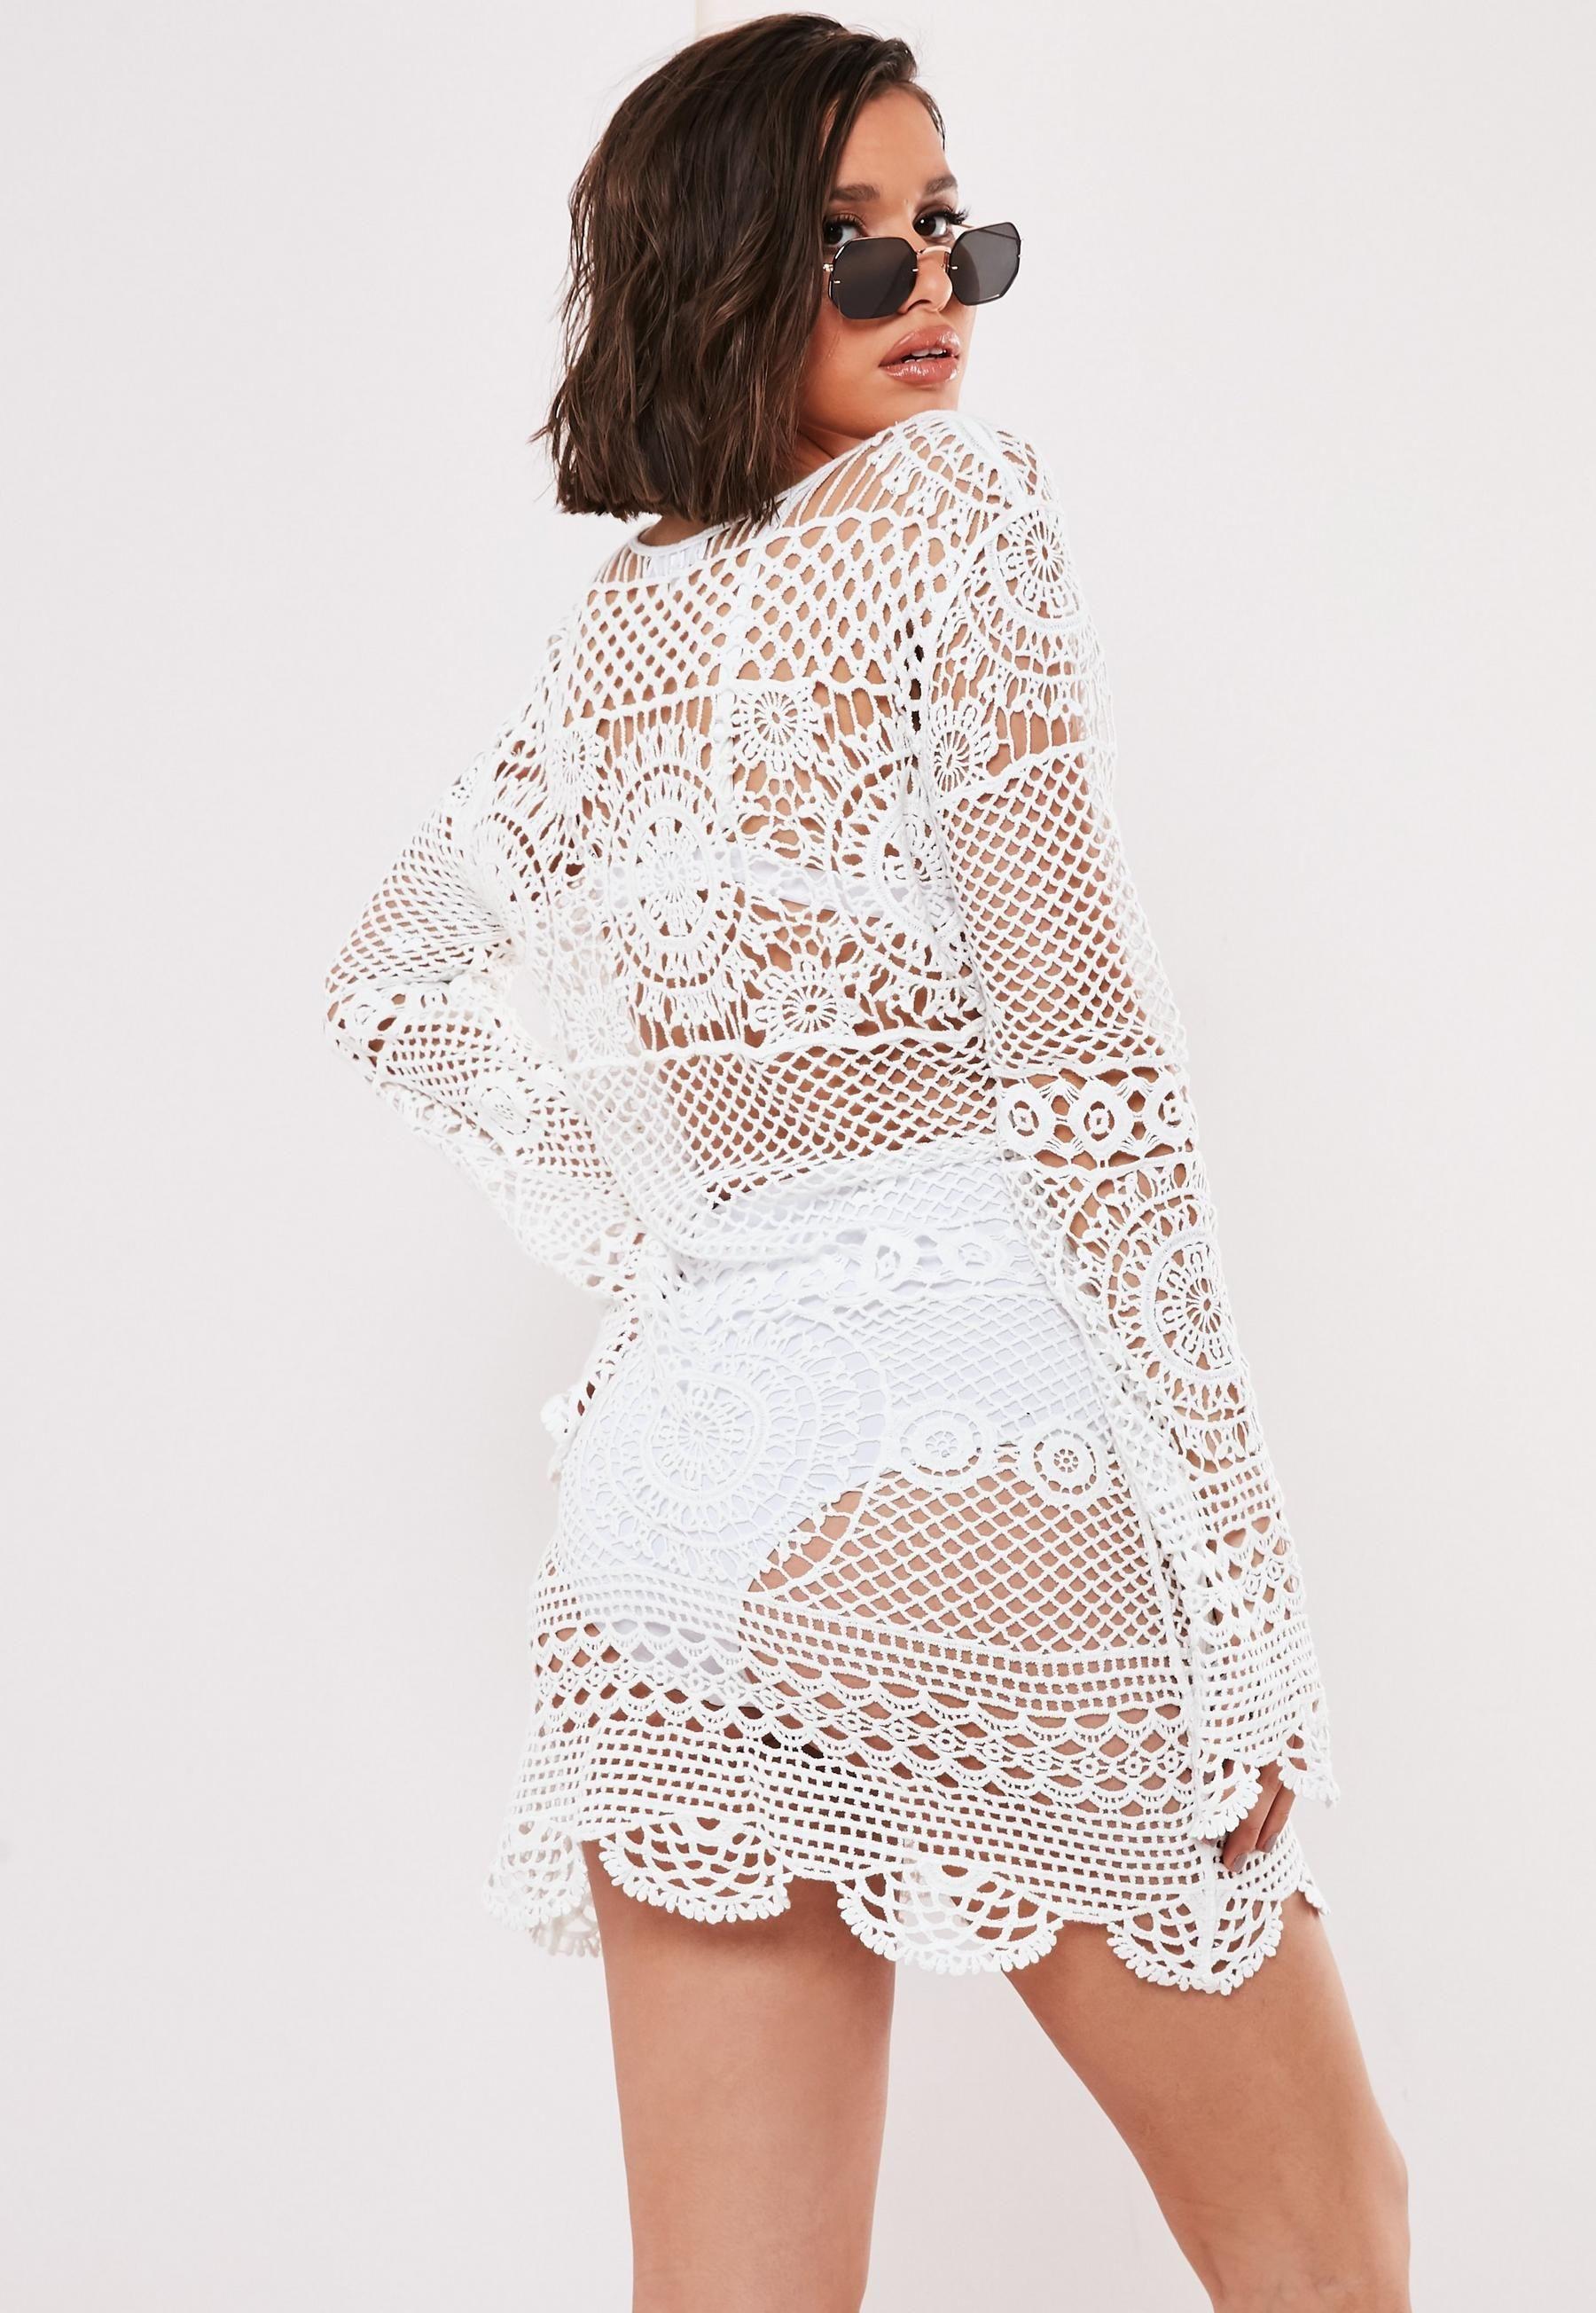 White Crochet Lace Up Mini Dress Missguided Mini Dress Long Sleeve Crochet Dress White Crochet